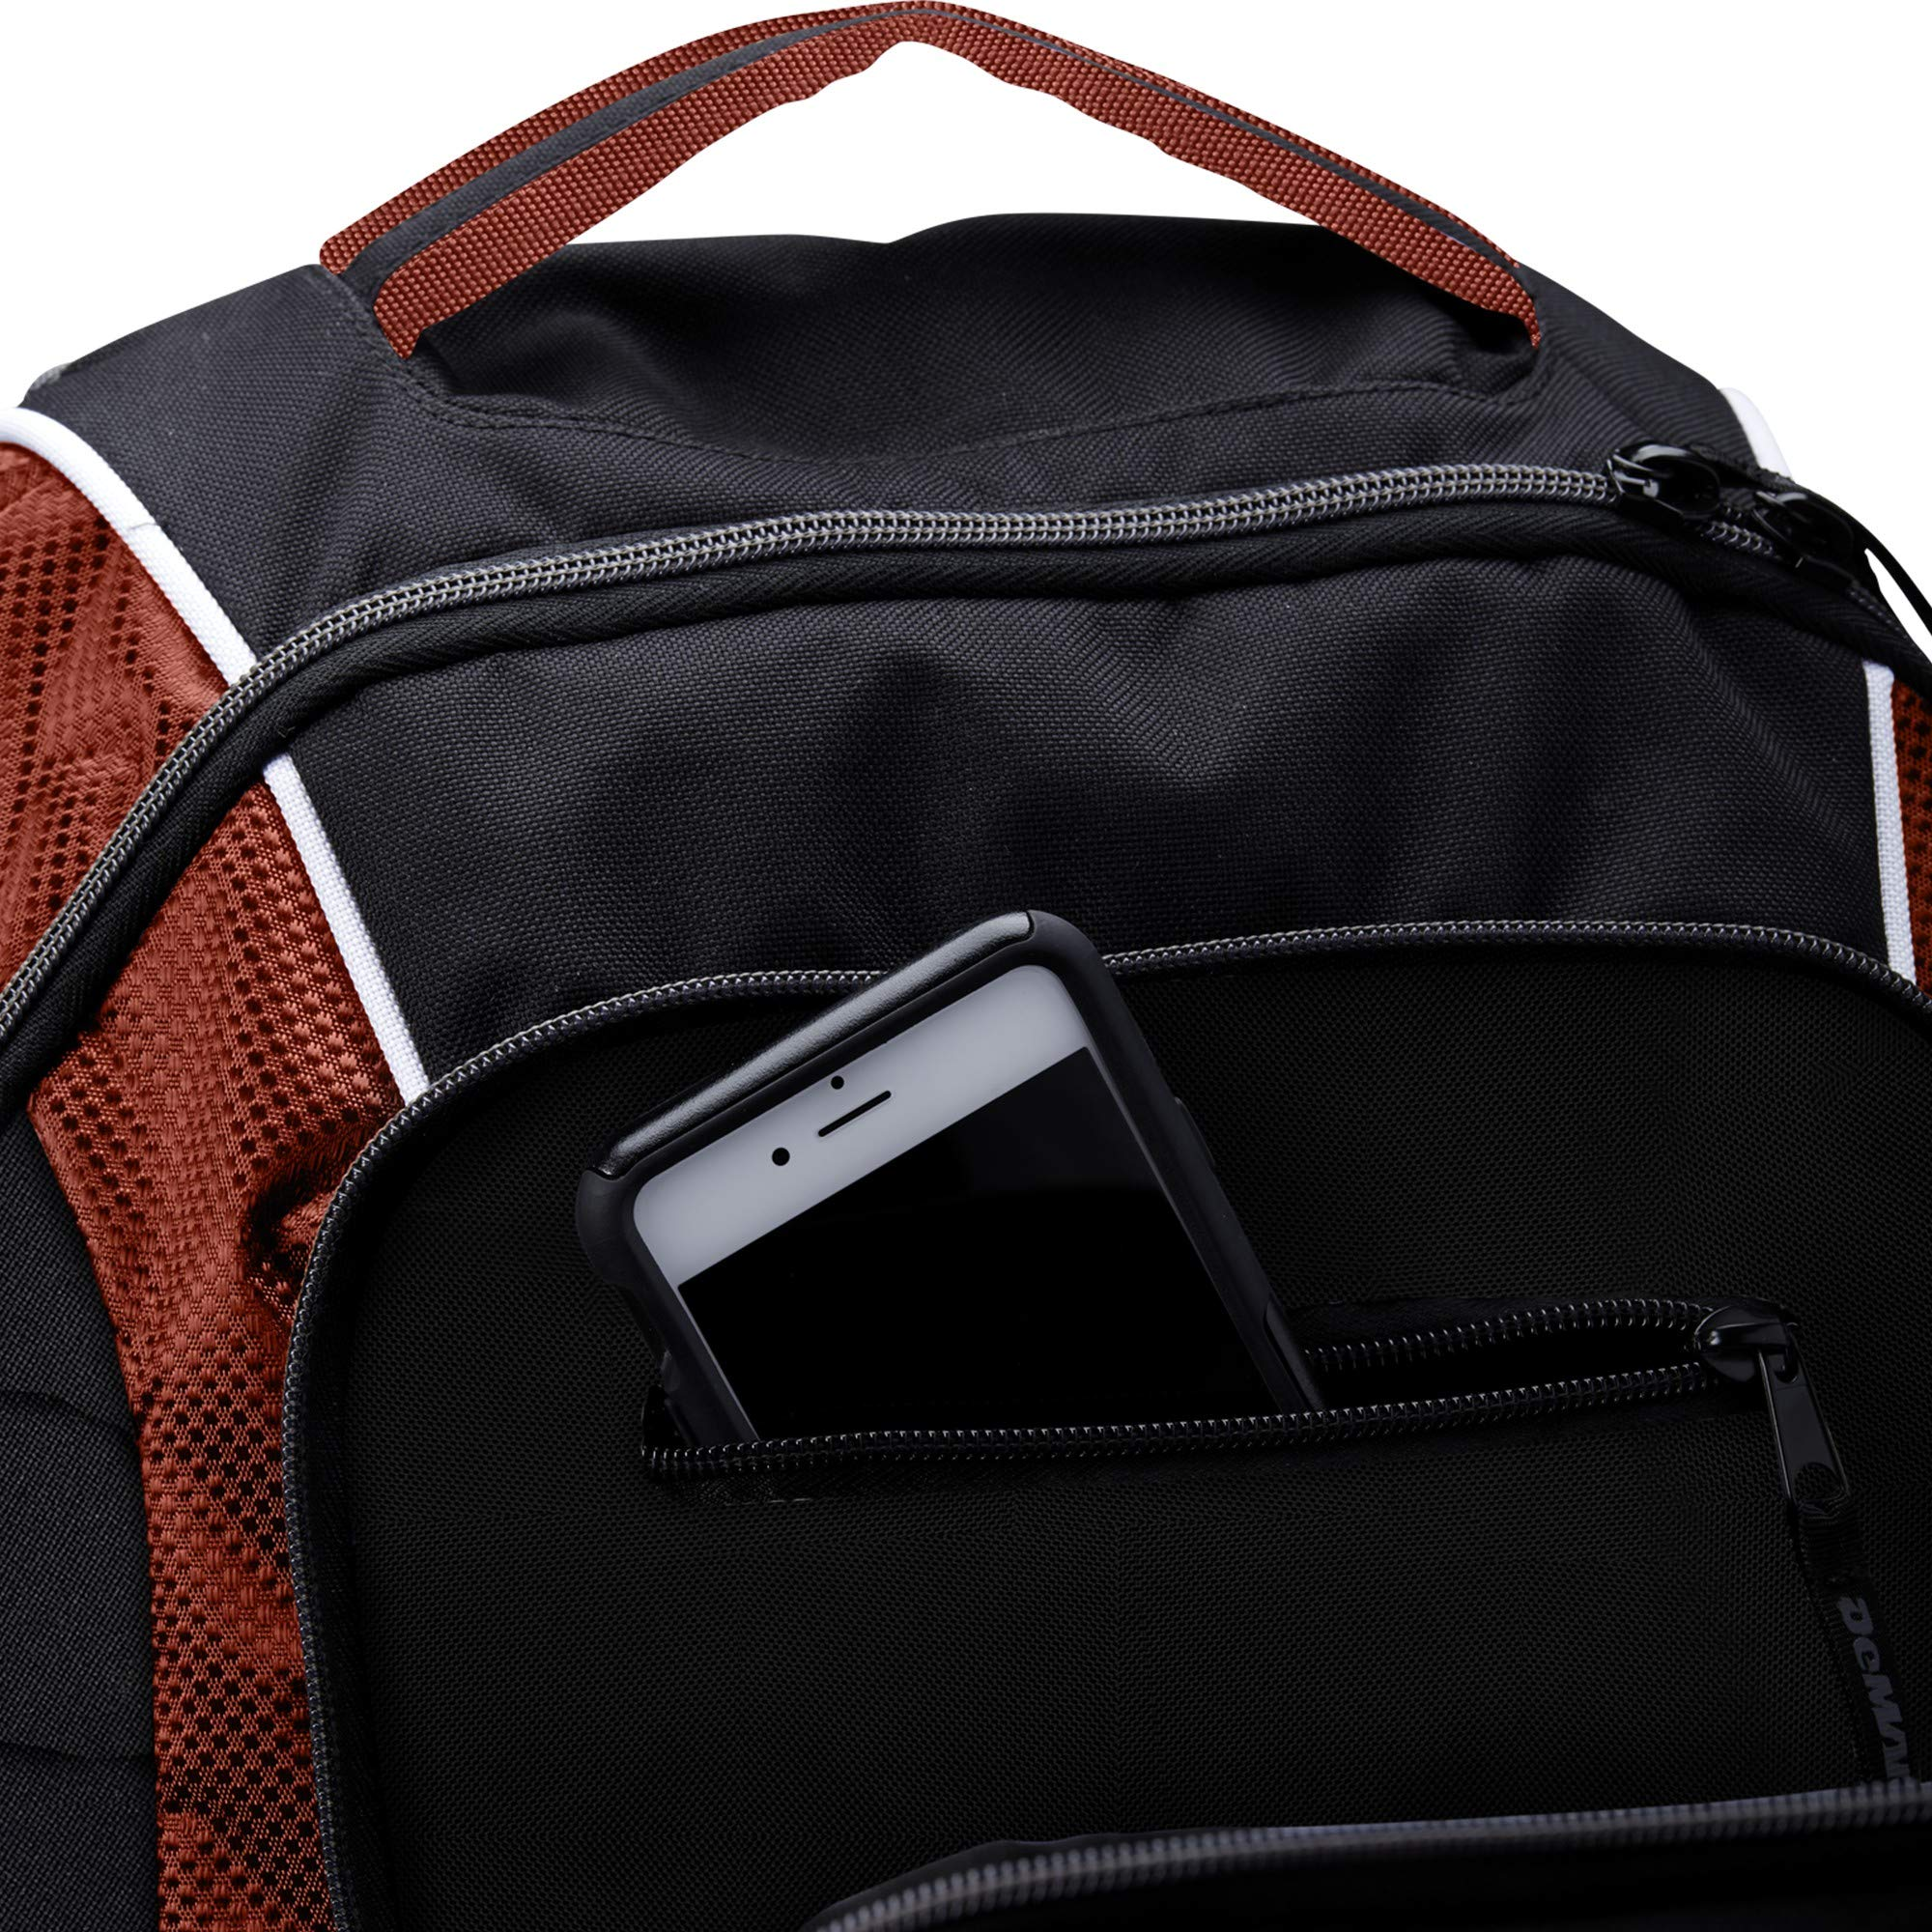 DeMarini WTD9407SC Momentum Backpack, Scarlet by DeMarini (Image #6)